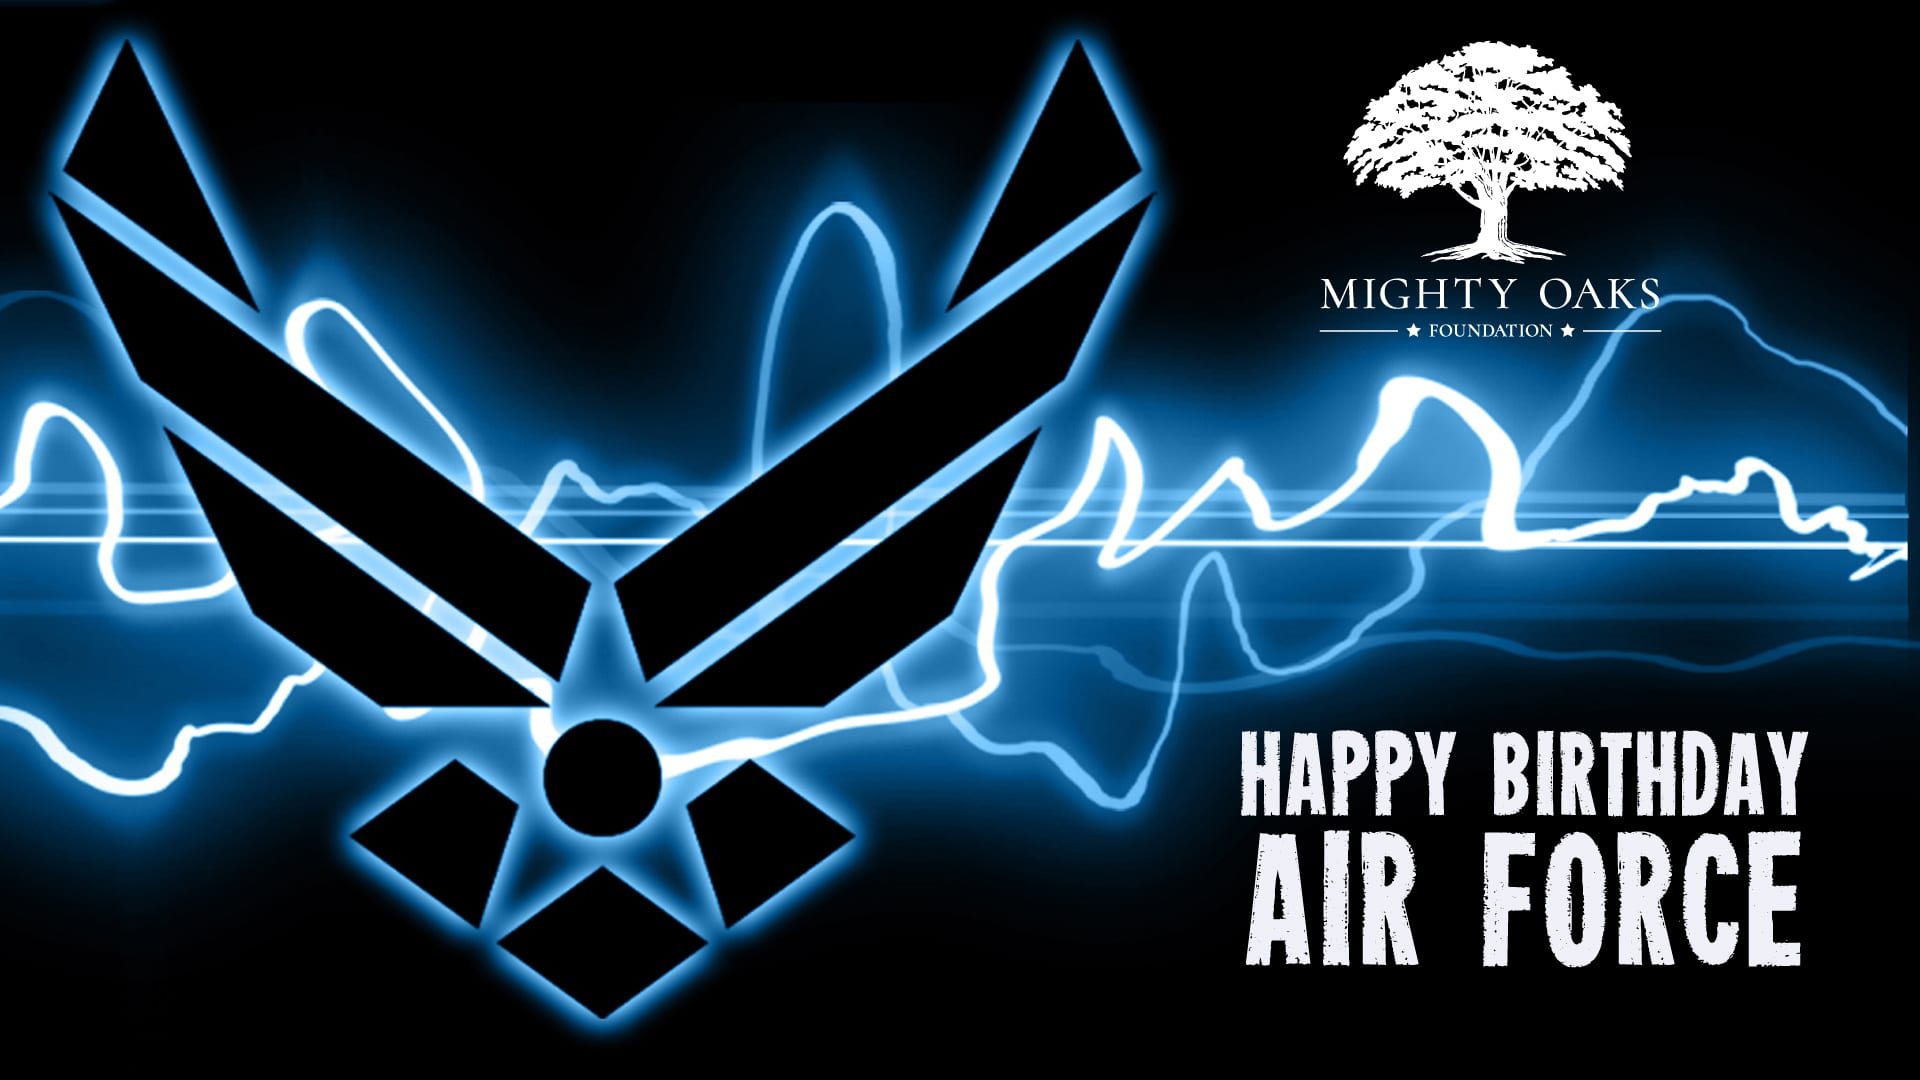 Happy Birthday Air Force Mighty Oaks Foundation